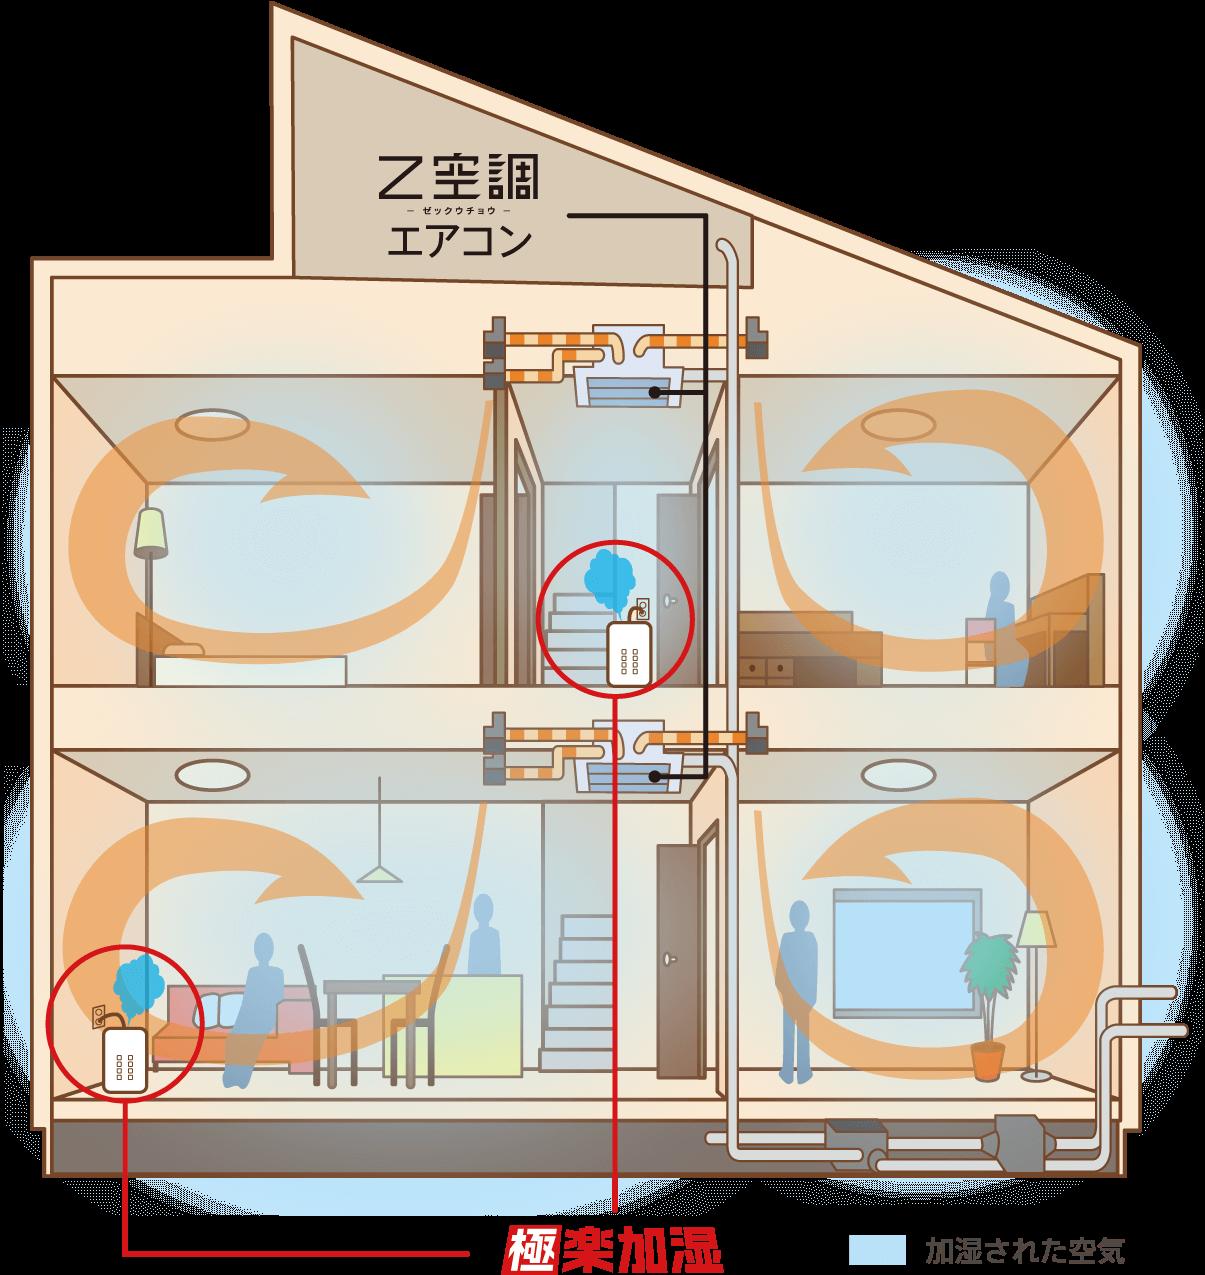 Z空調エアコン